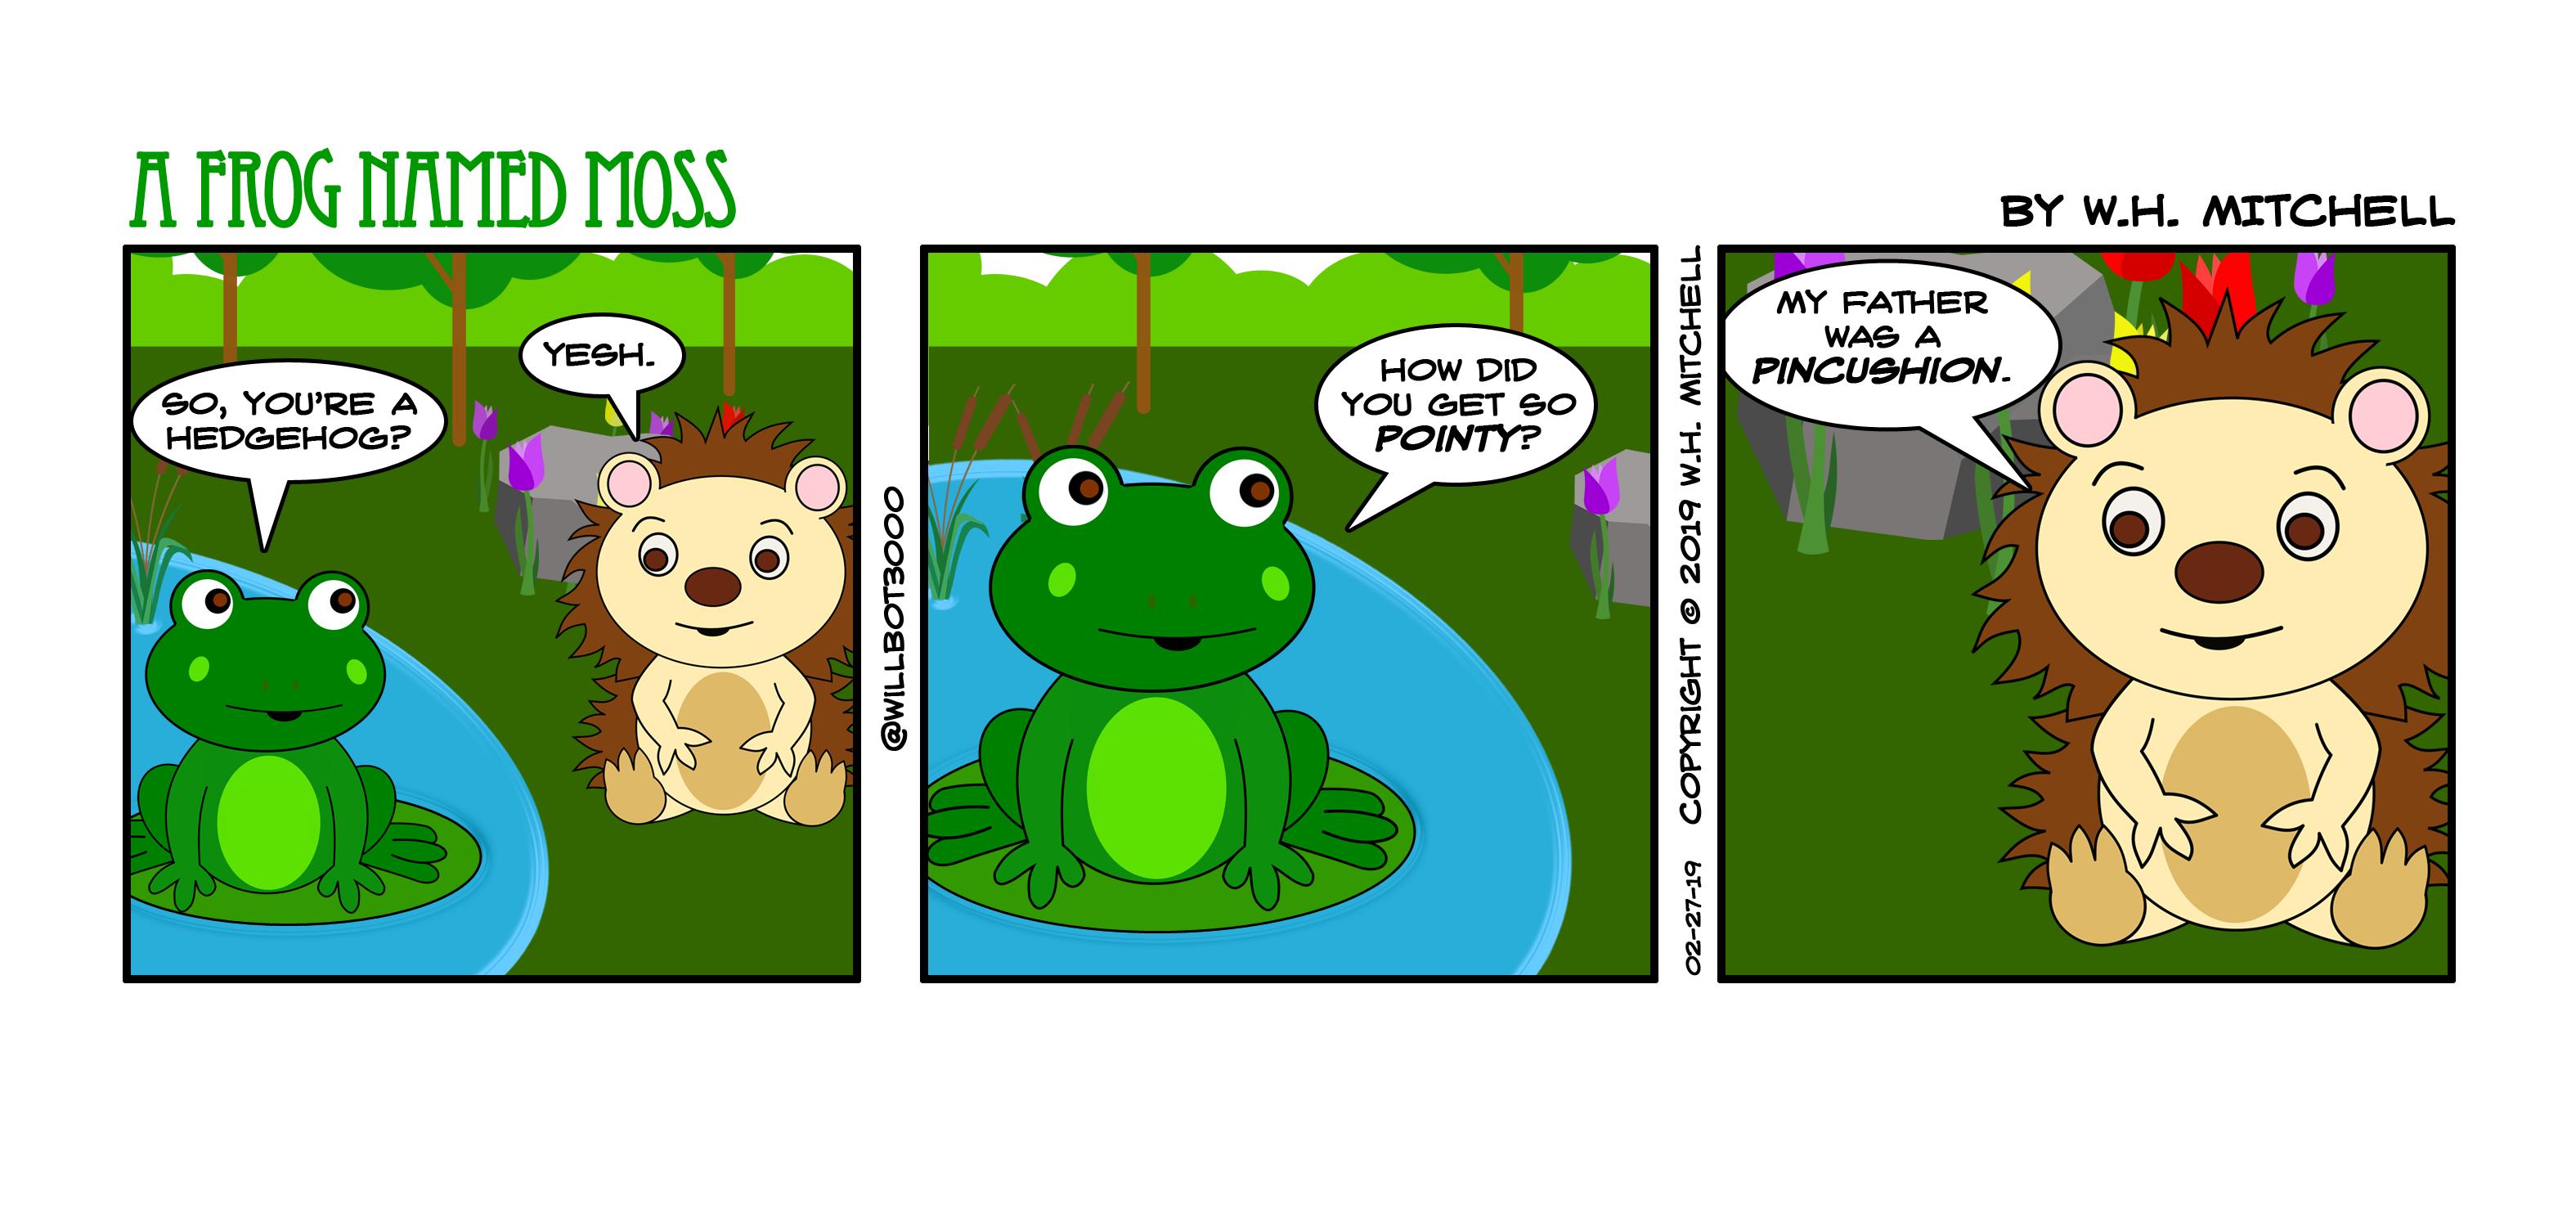 Prickly Pa - Comic 2/27/19